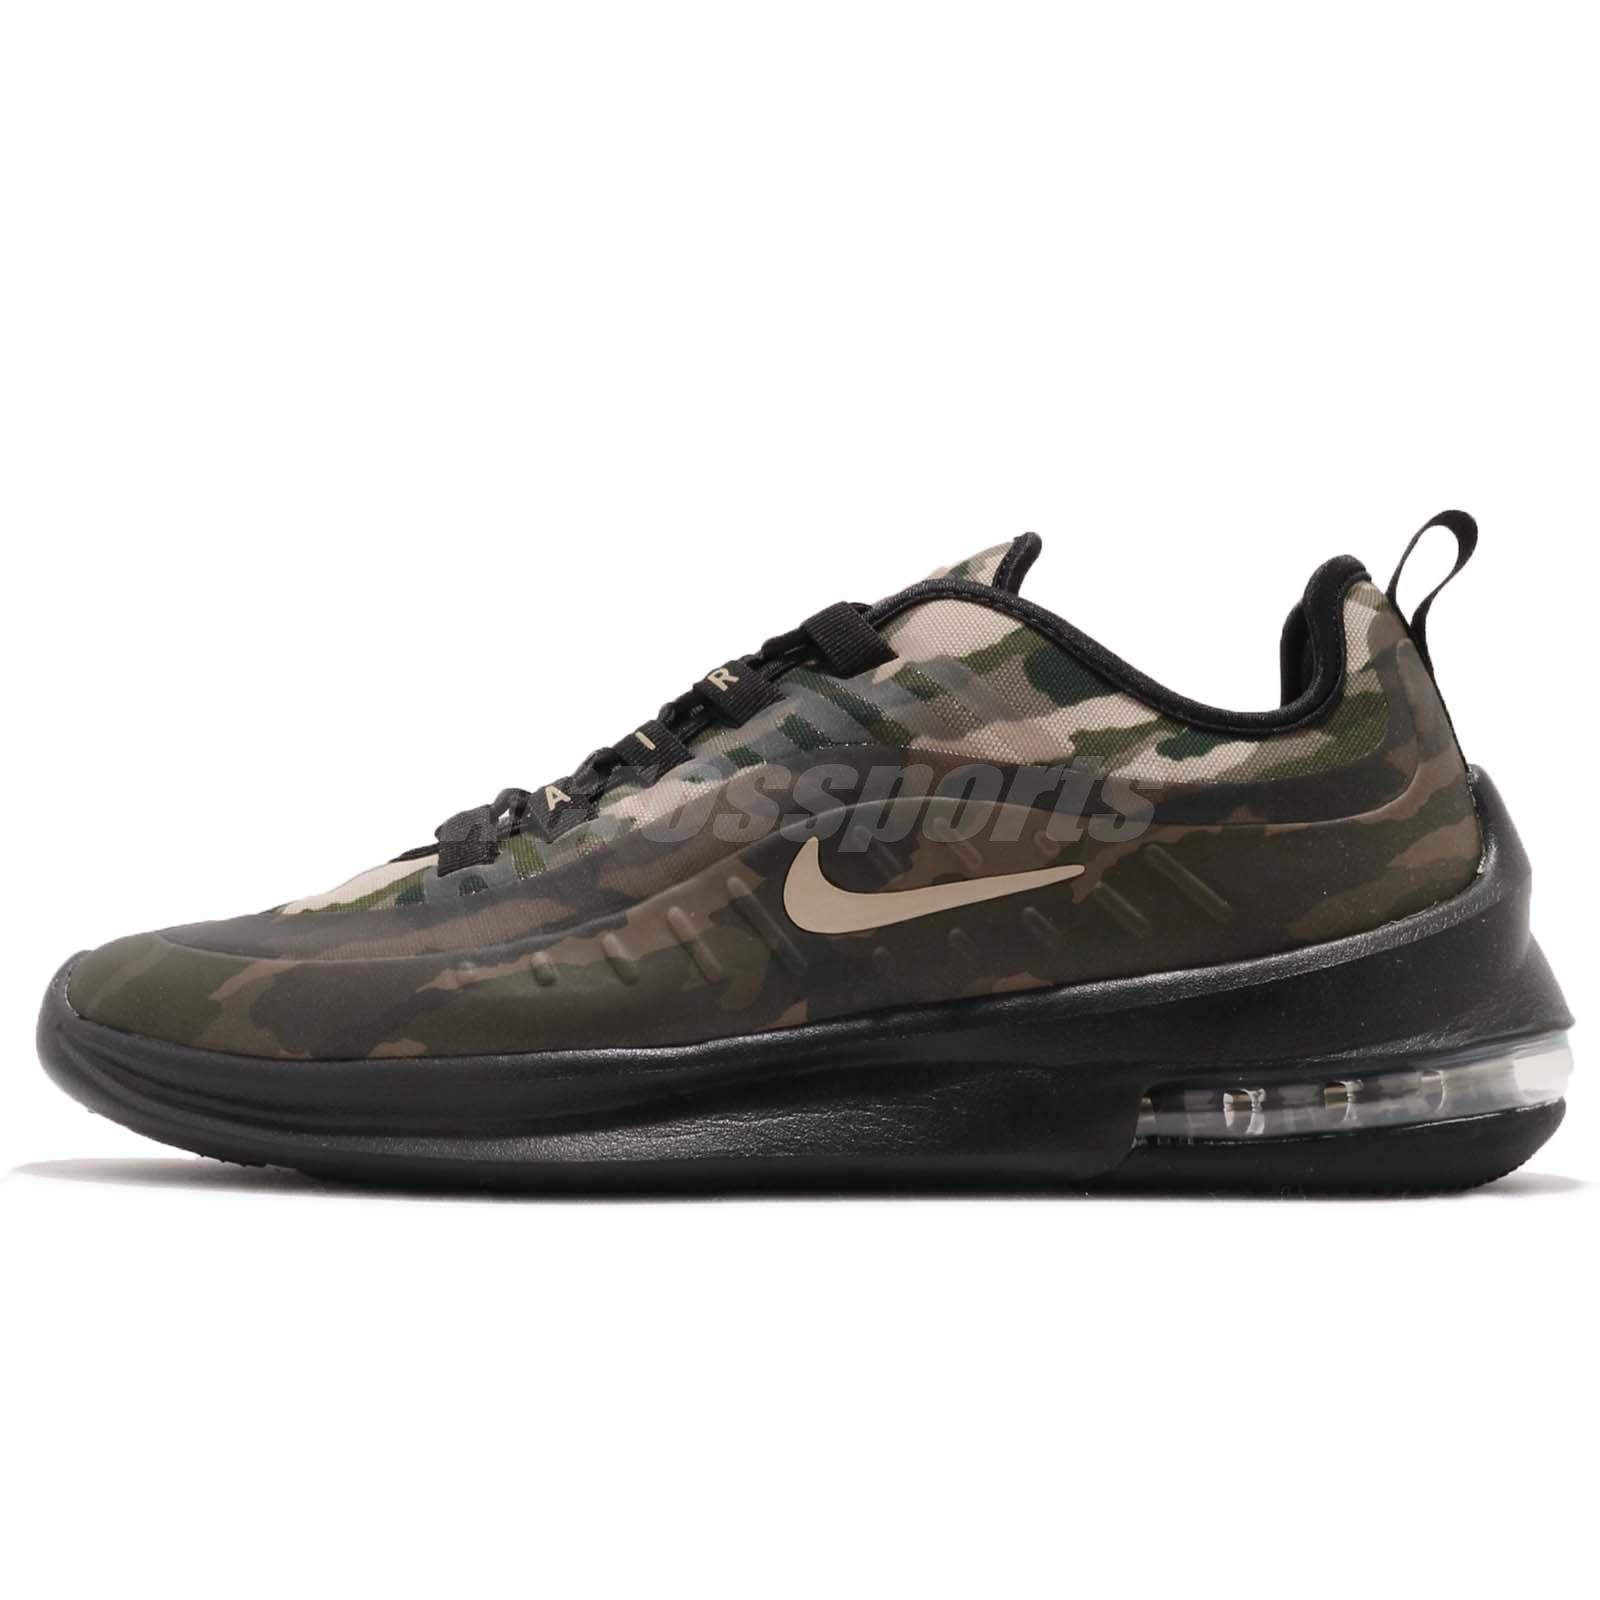 Details about Nike Air Max Axis PREM Black Mushroom Camo Men Running Shoes  Sneakers AA2148-002 cd602637b